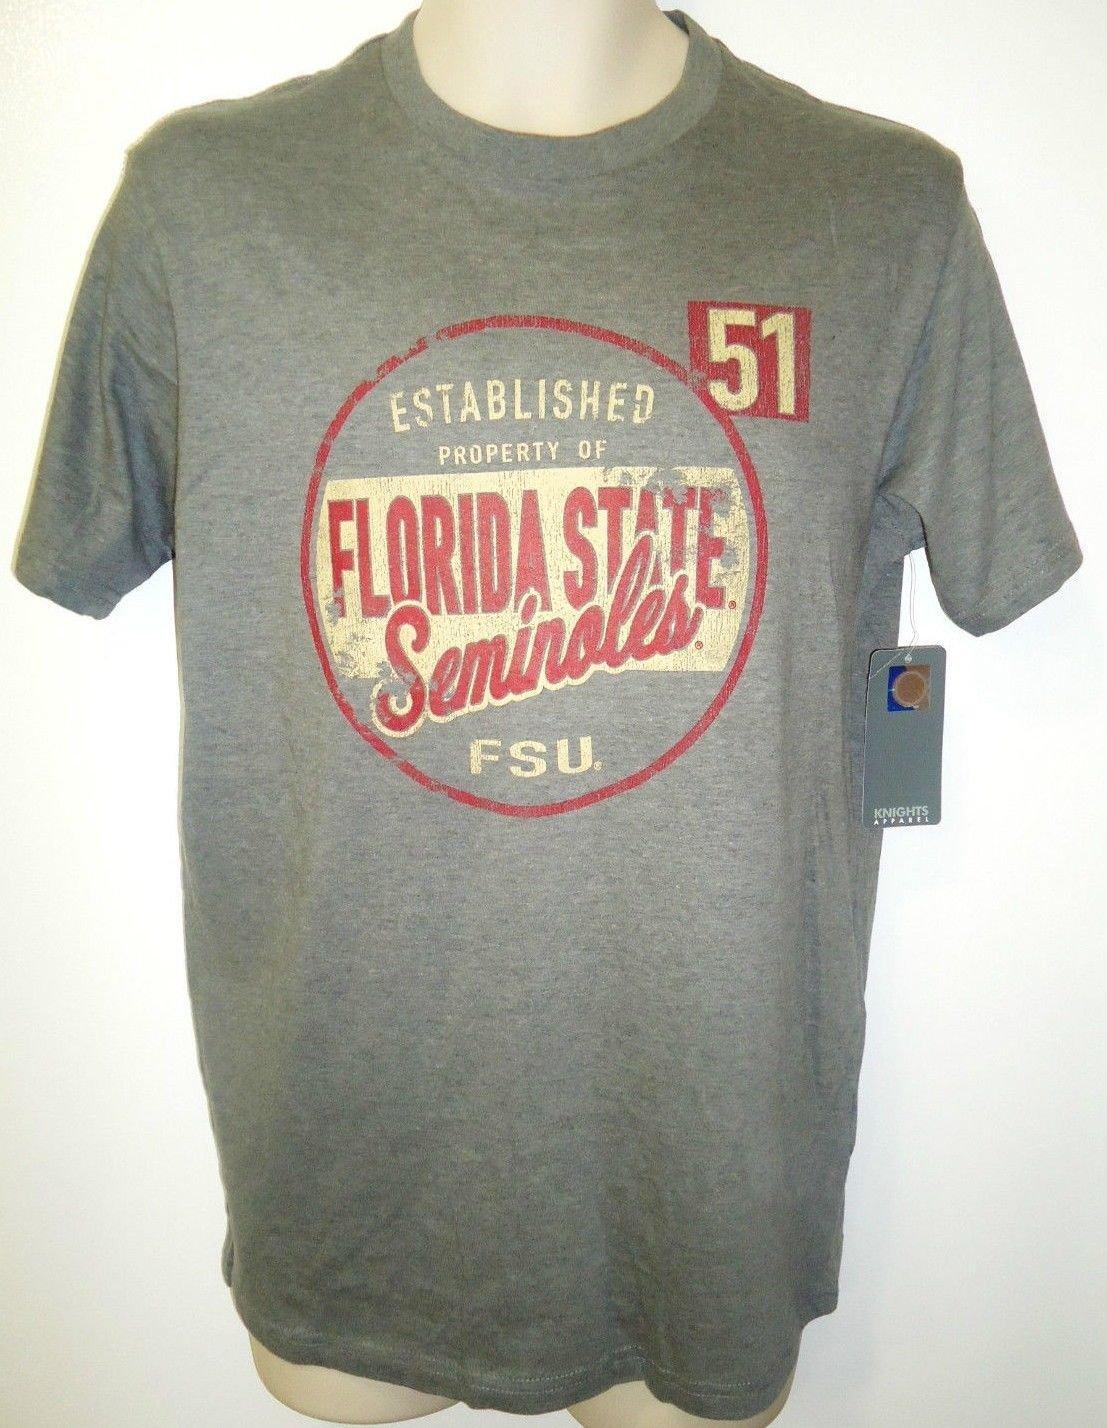 FLORIDA STATE - SEMINOLES - NCAA - FOOTBALL - T-SHIRT - NEW - MEDIUM - GRAY